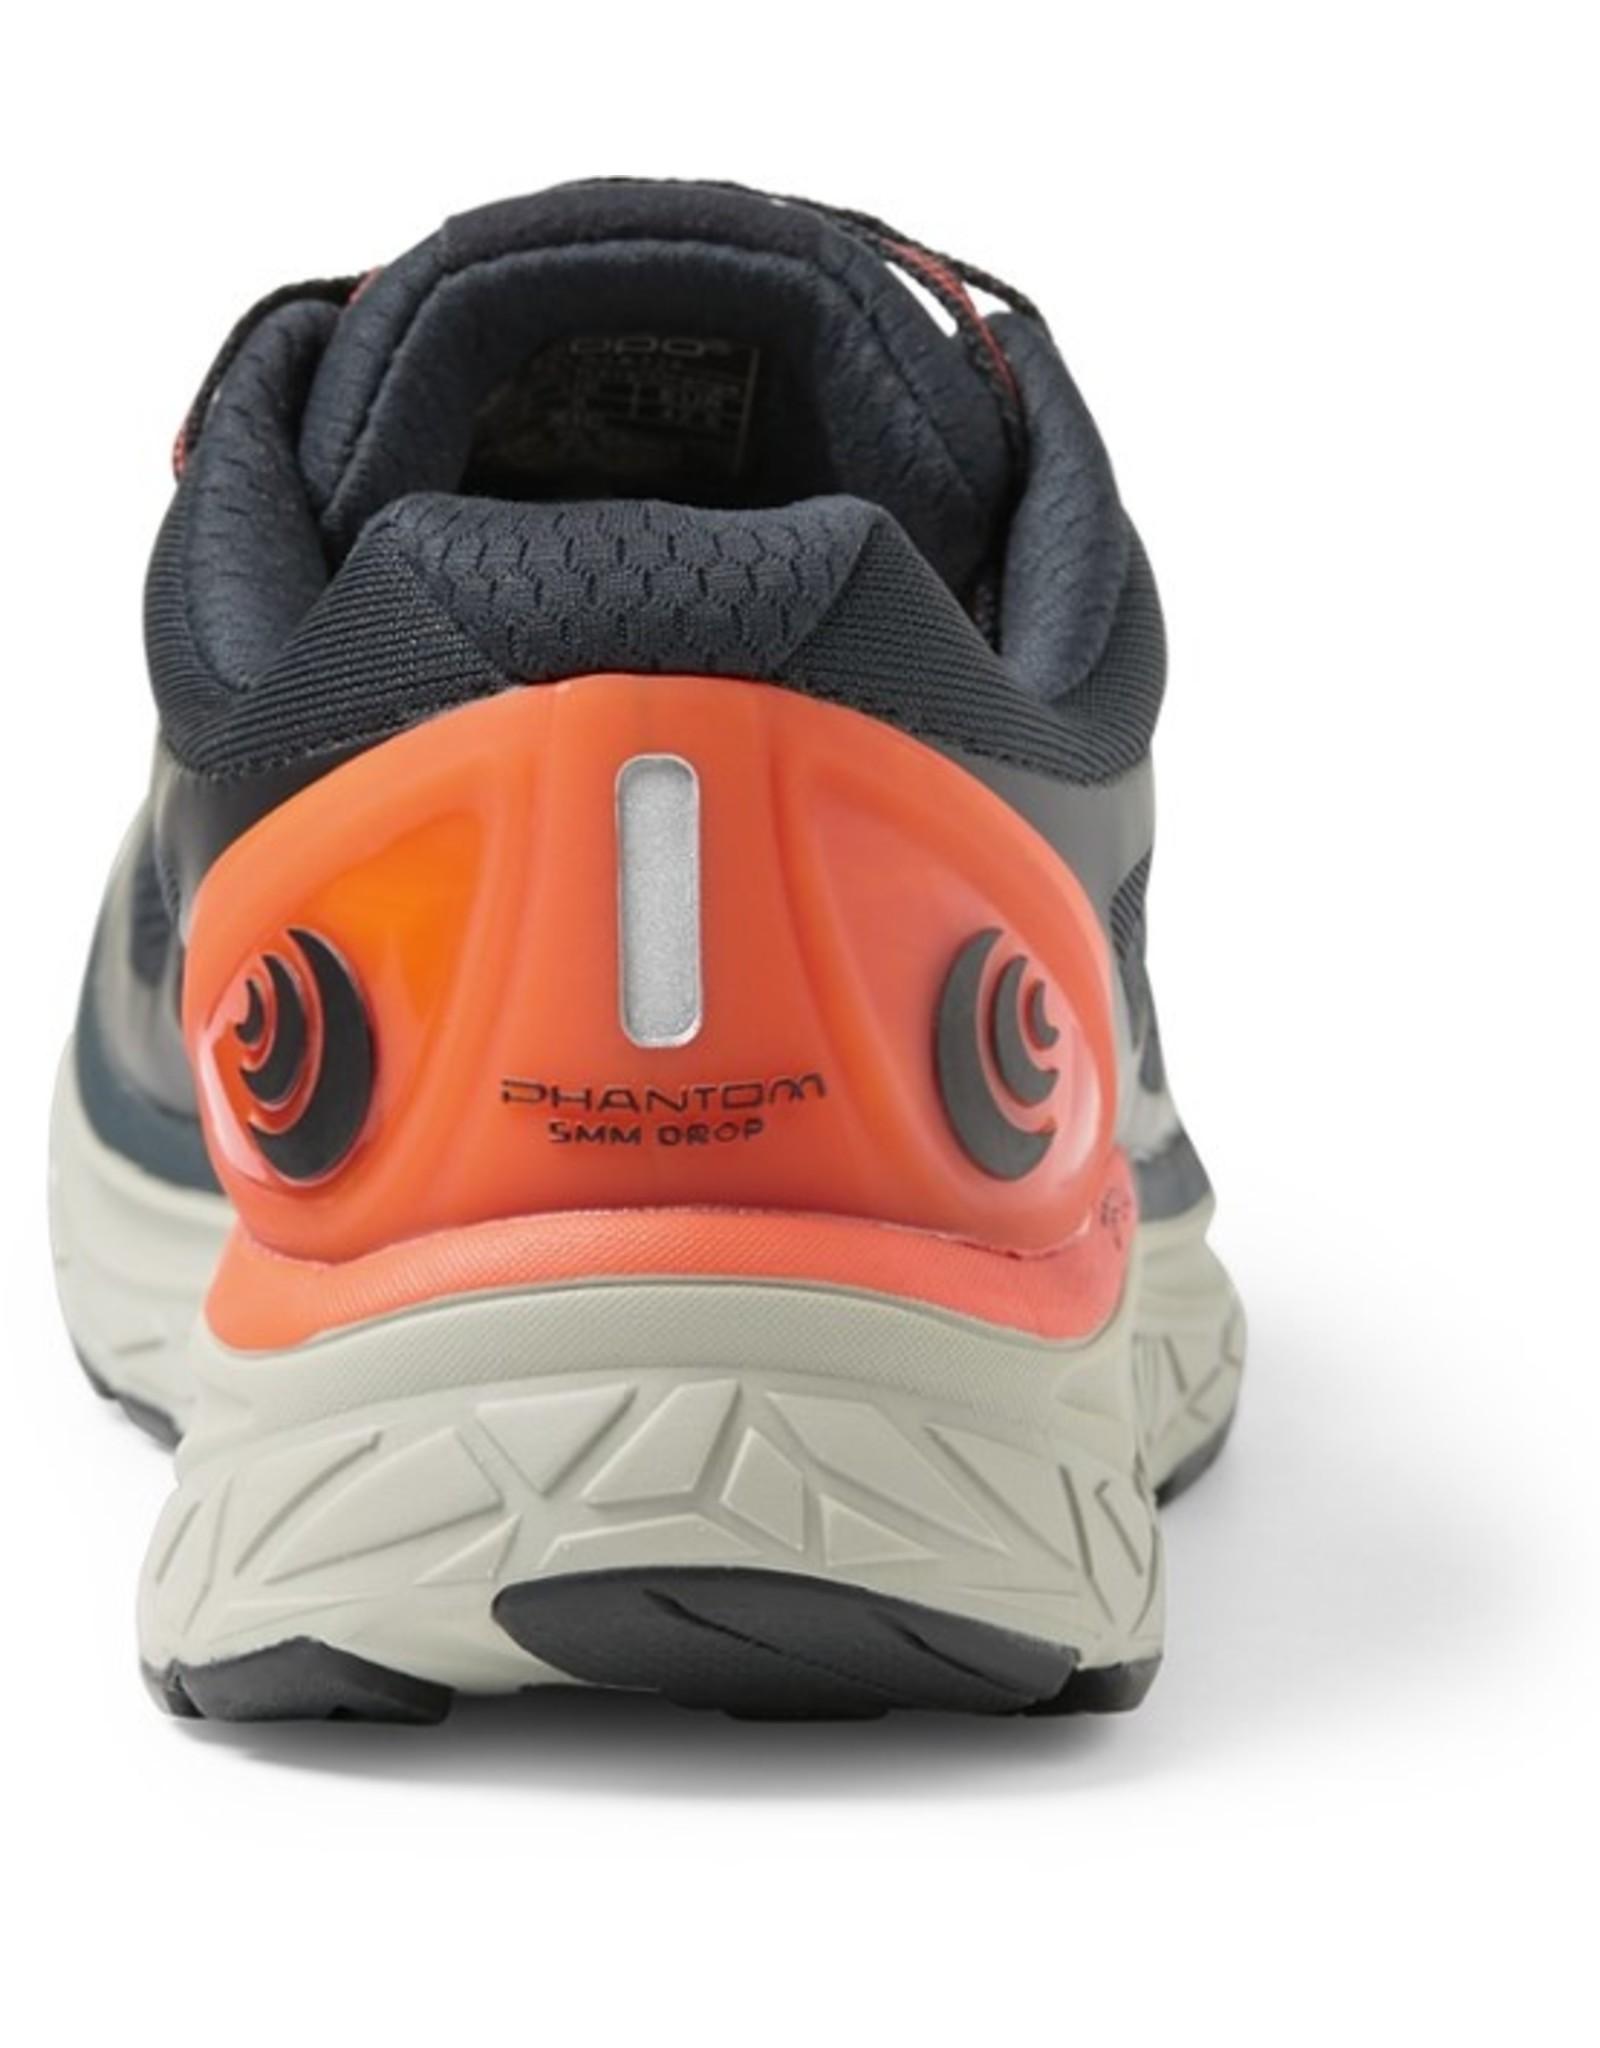 Topo Athletic Phantom Men's Road Running Shoe Navy/Orange Size 10